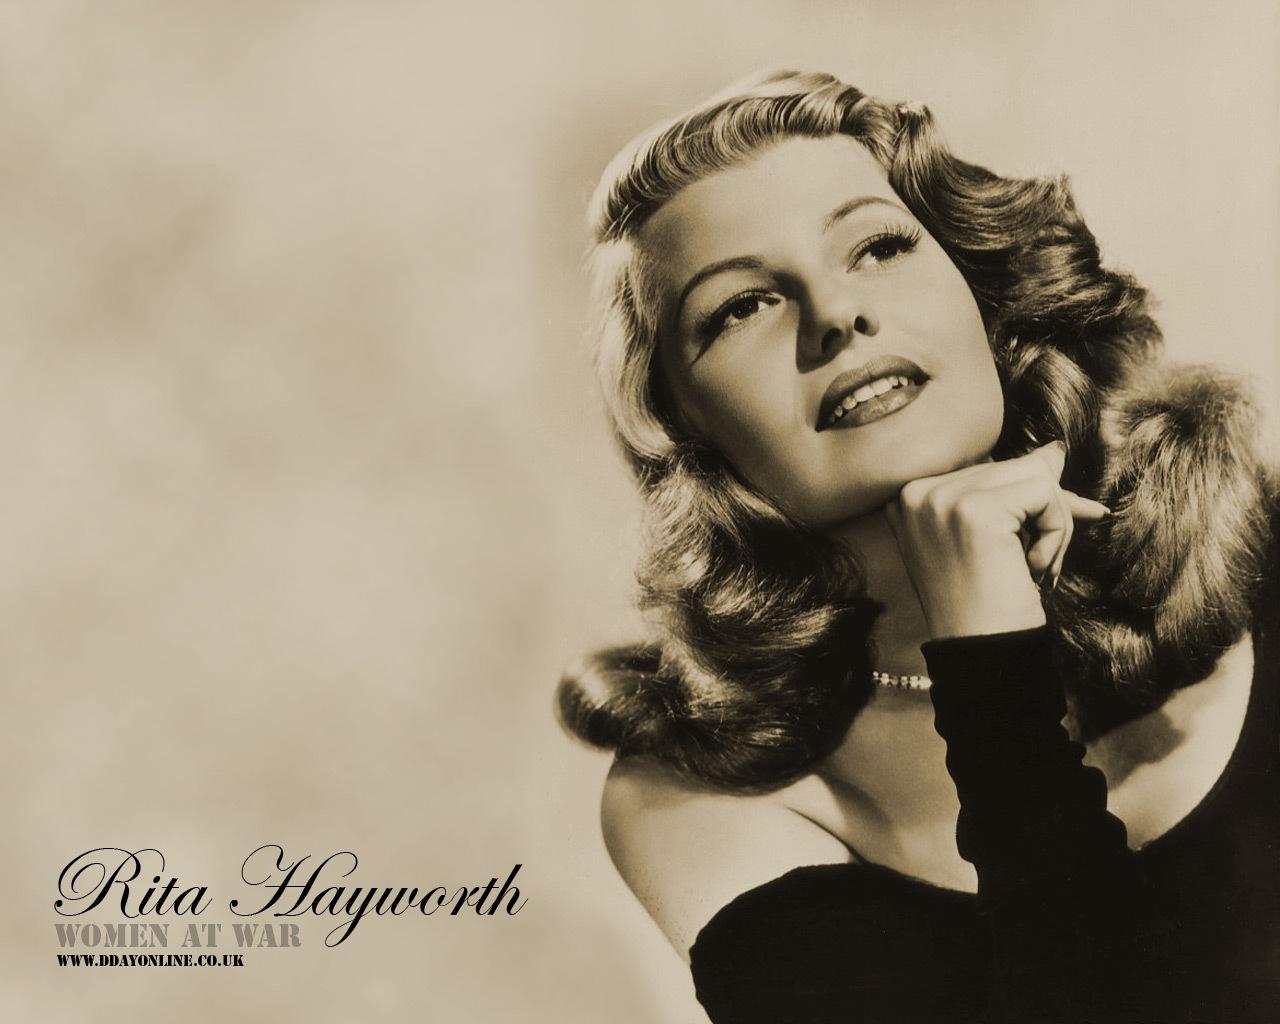 Rita Hayworth - Rita Hayworth Wallpaper (9590603) - Fanpop